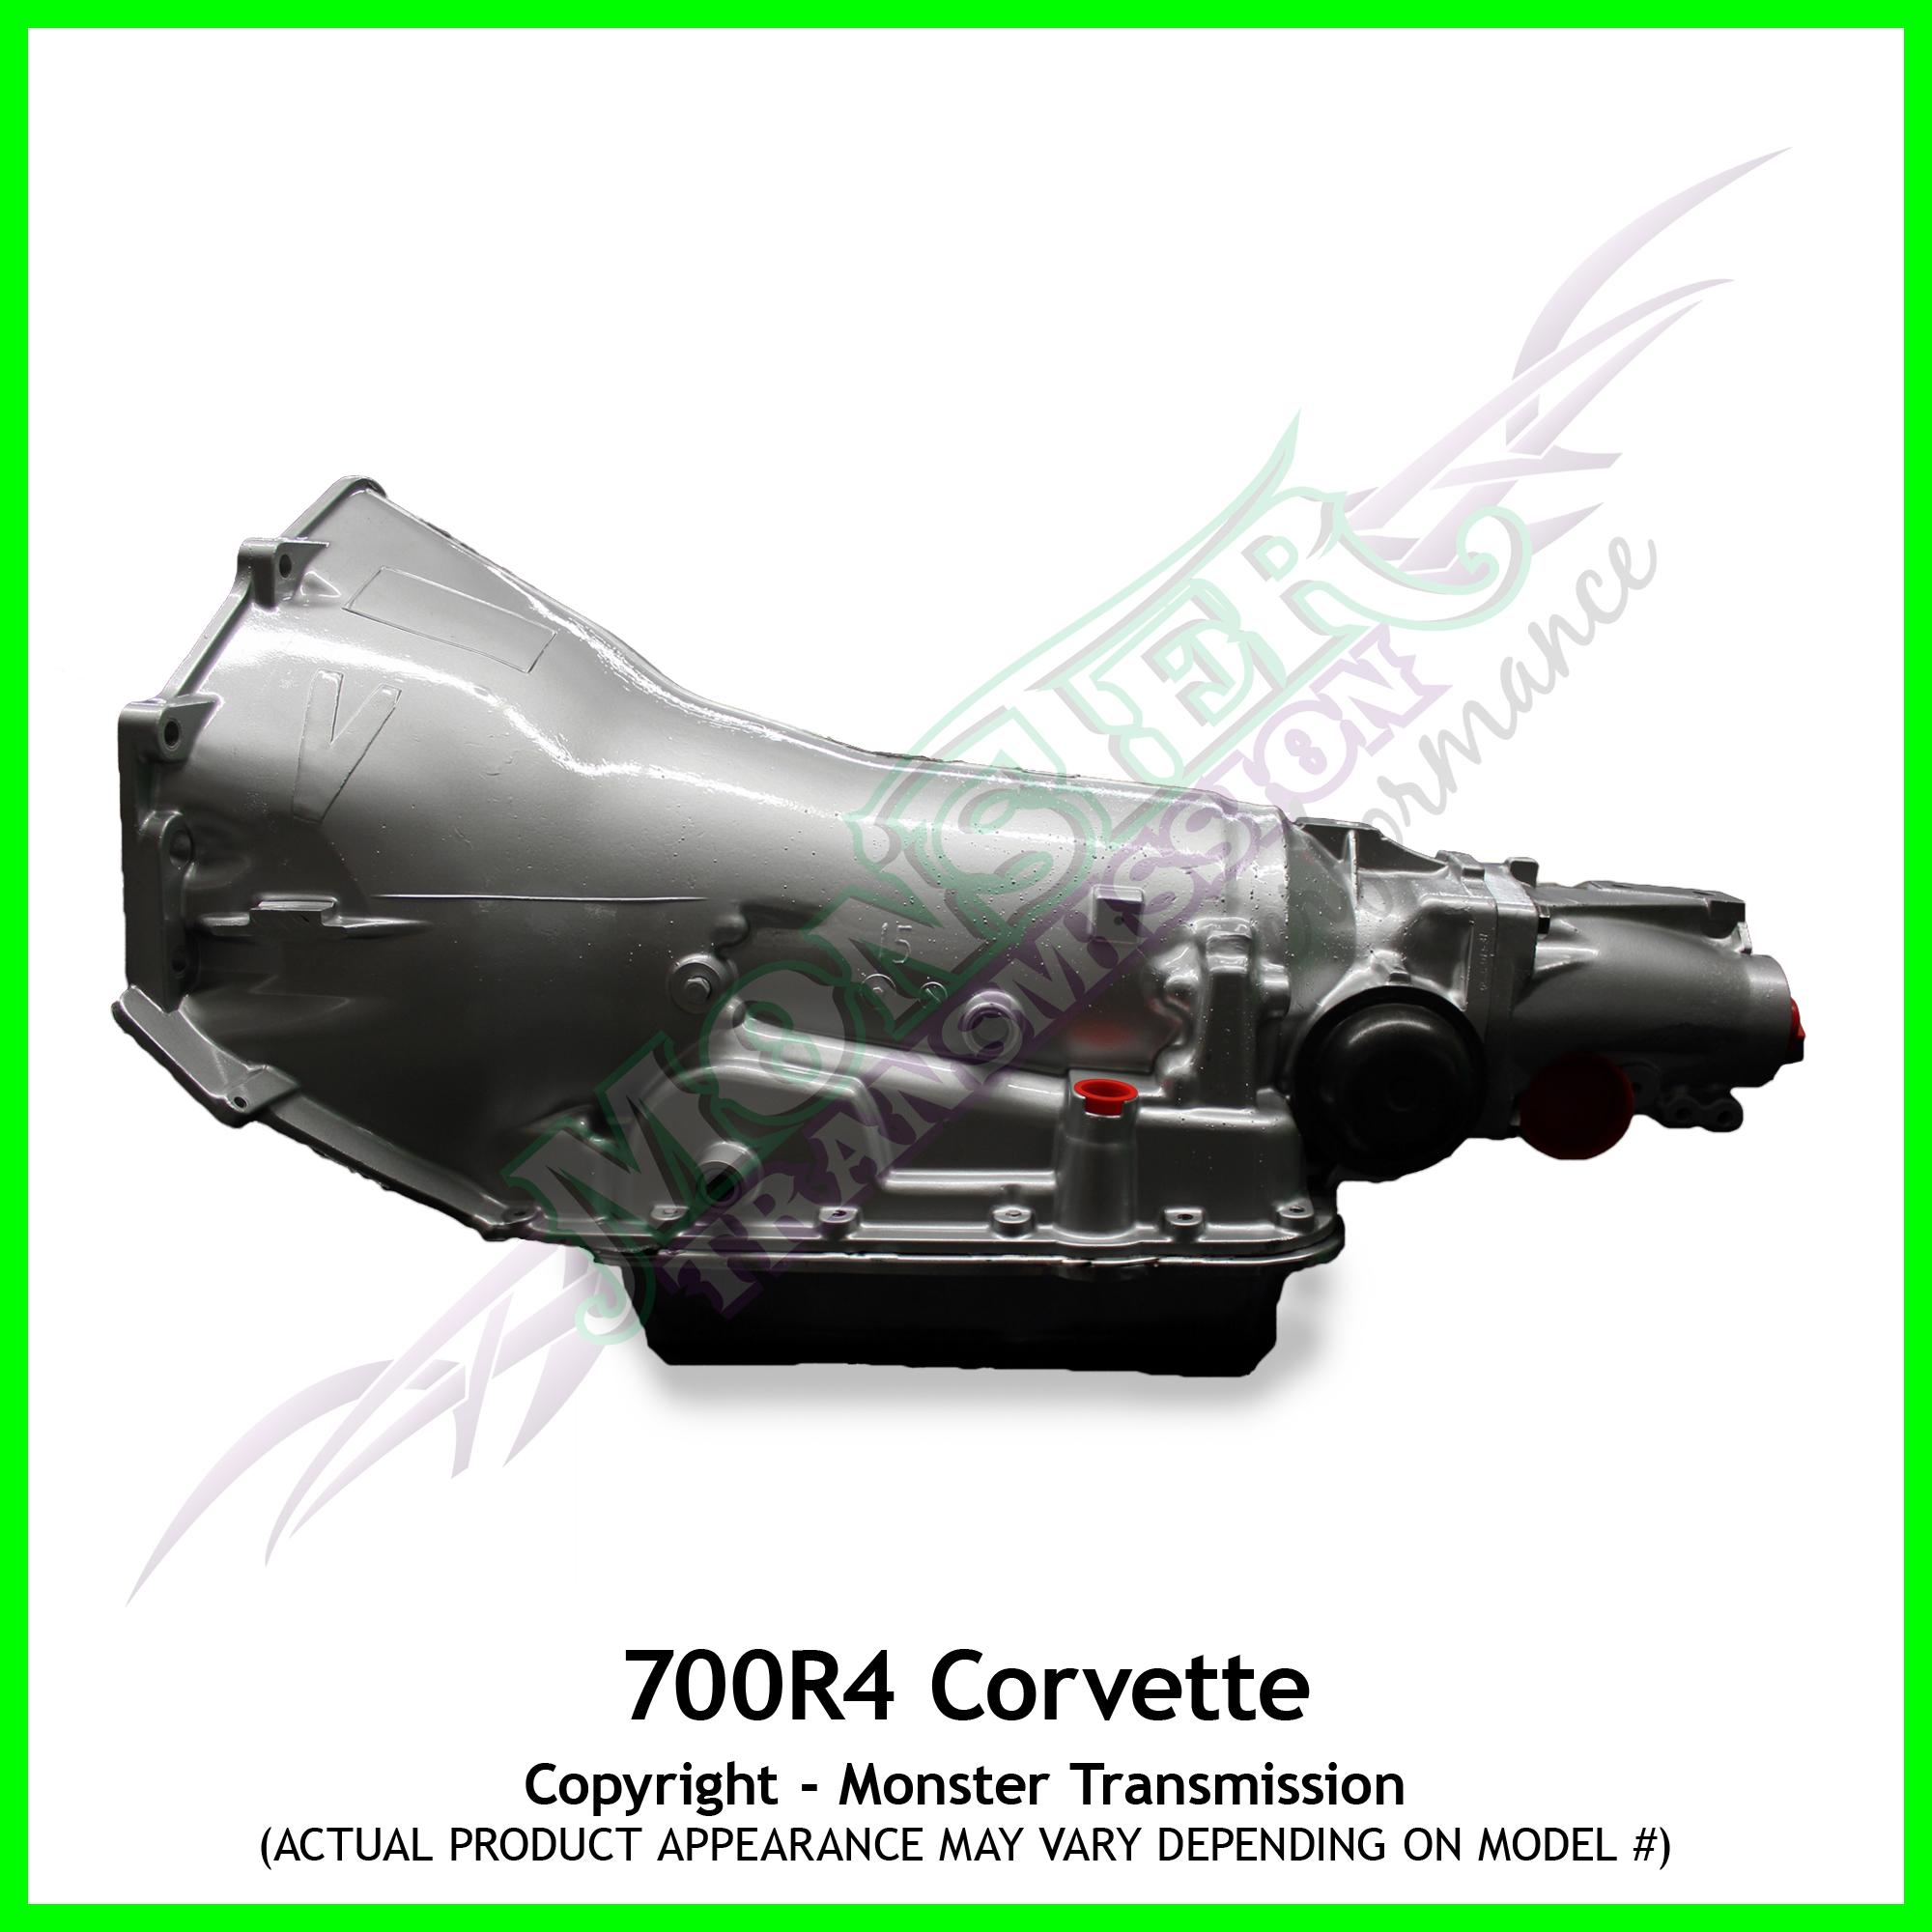 Corvette 700r4 Transmission Heavy Duty 2wd Gm Vacuum Diagram High Performance